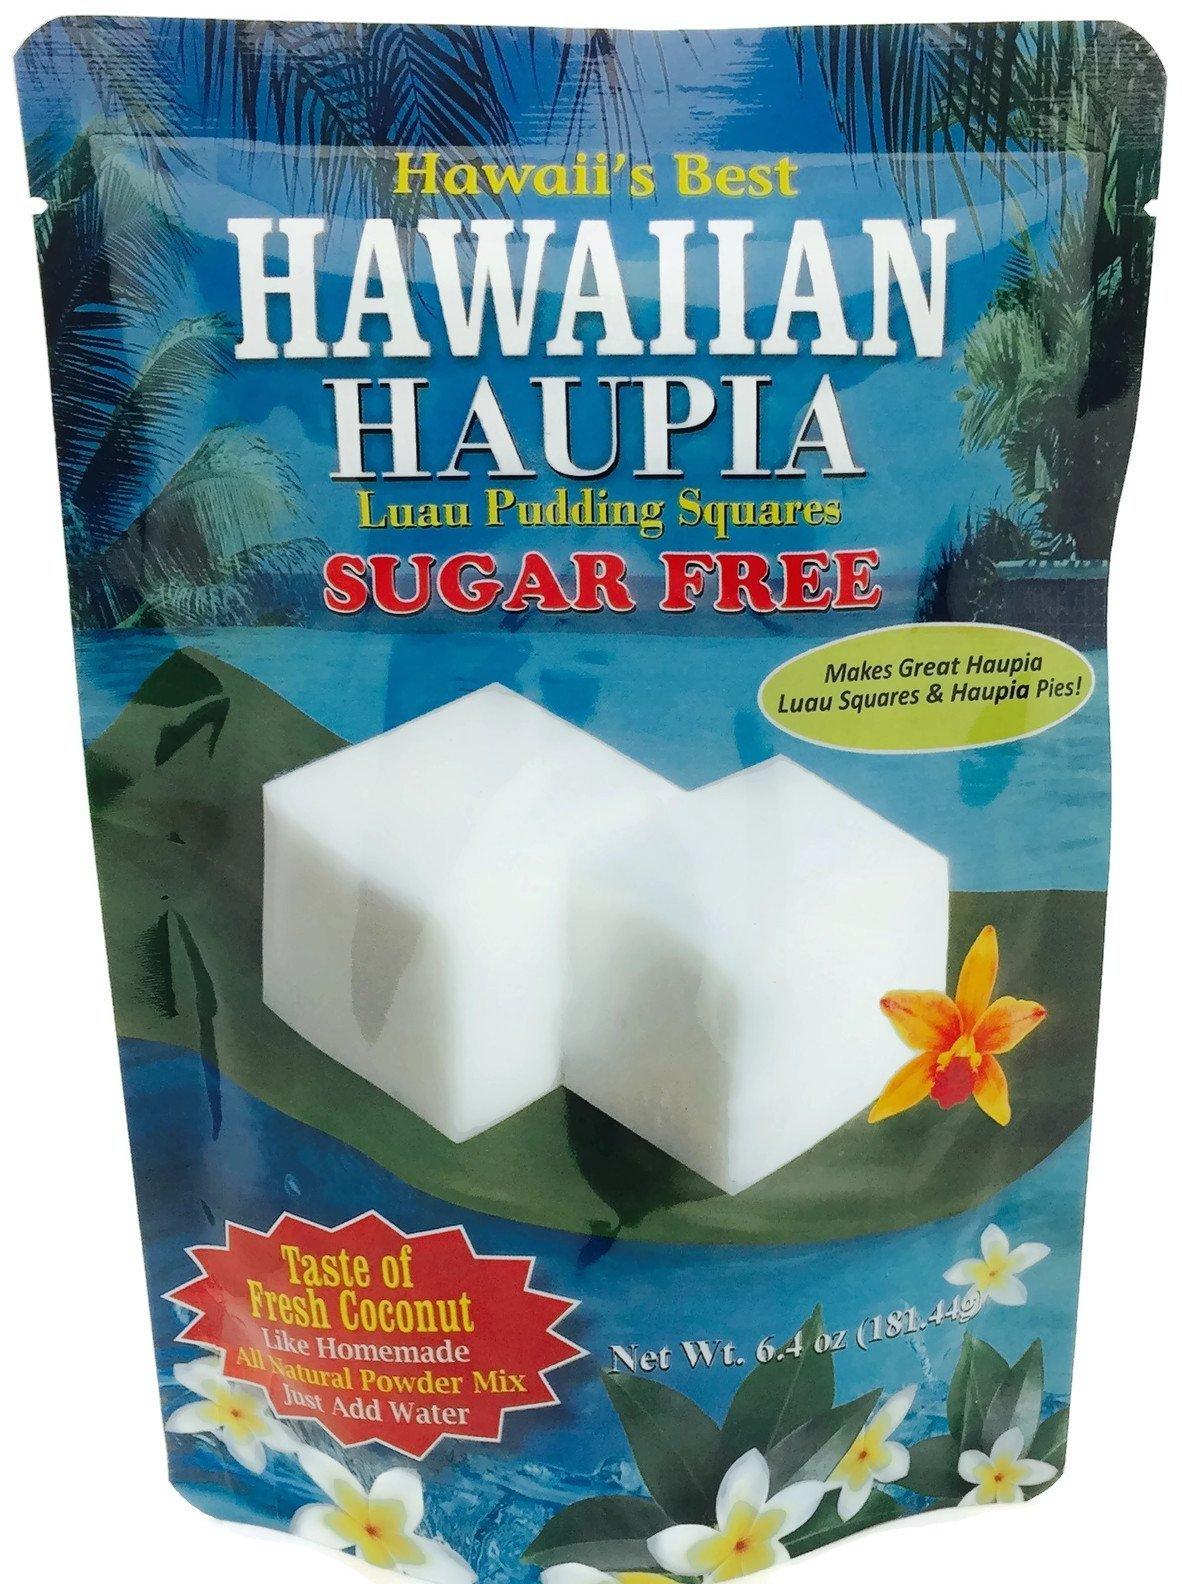 Kauai Tropical Syrup Sugar Free Hawaiian Haupia Luau Pudding Squares, 6.4 Ounce by Kauai Tropical Syrup, Inc (Image #1)